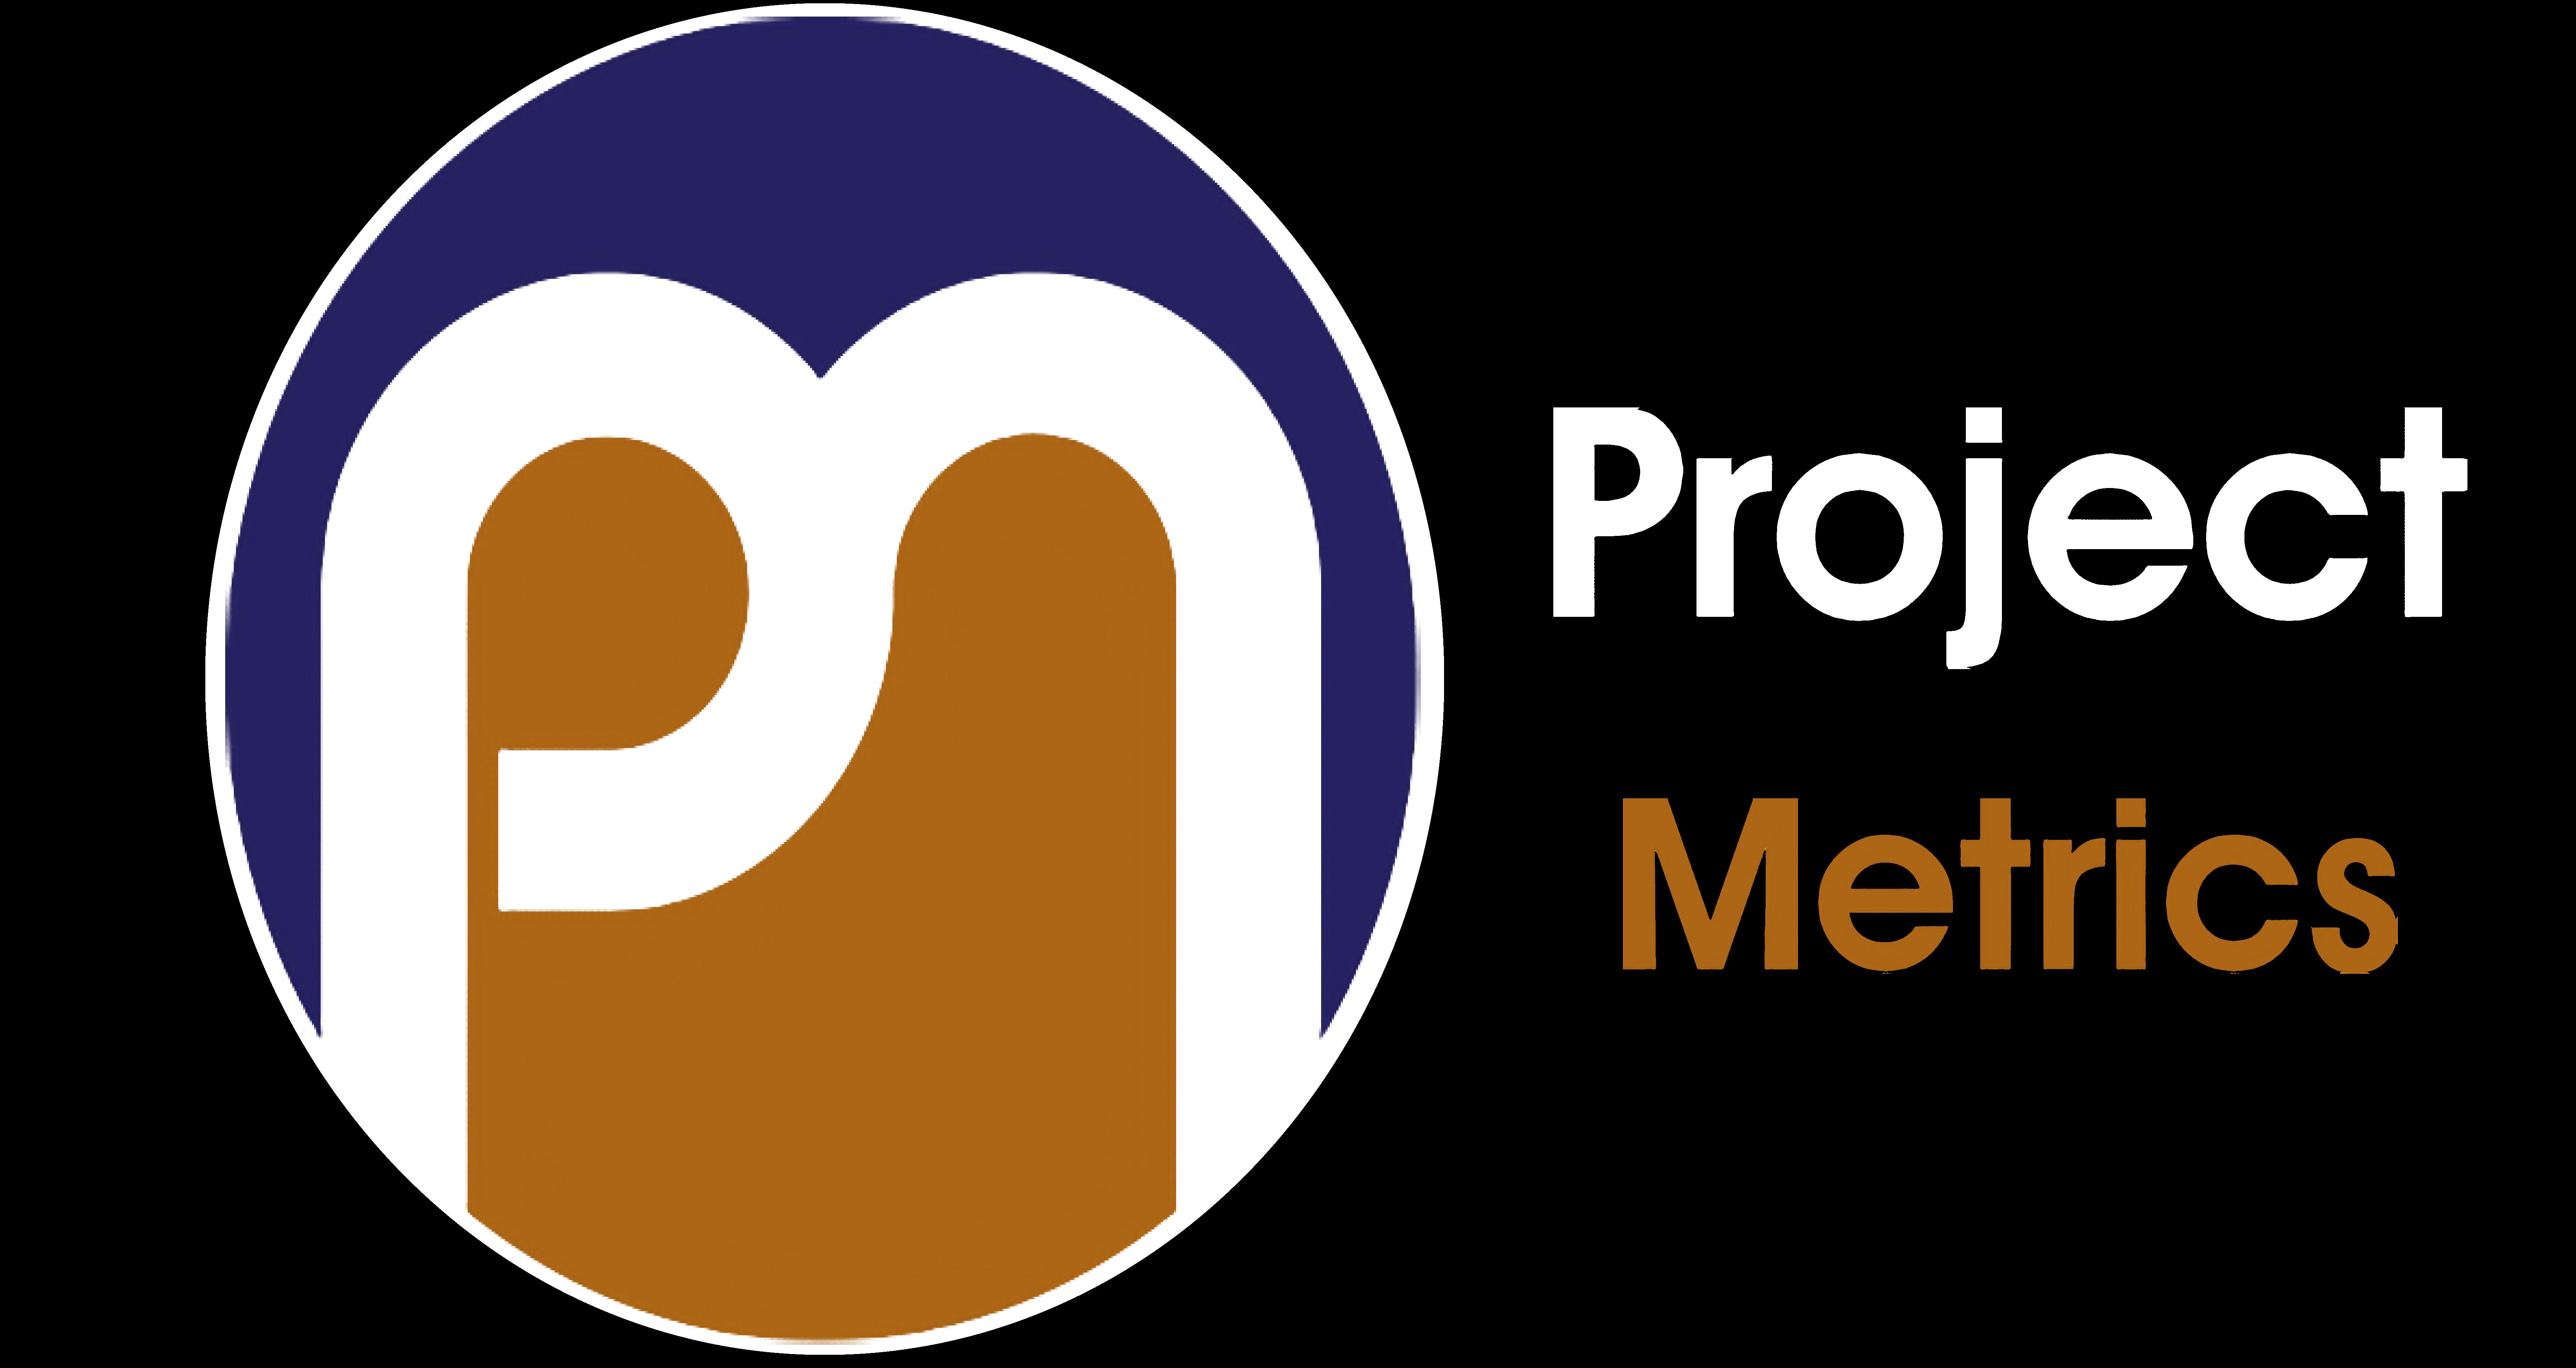 ProjectMetrics